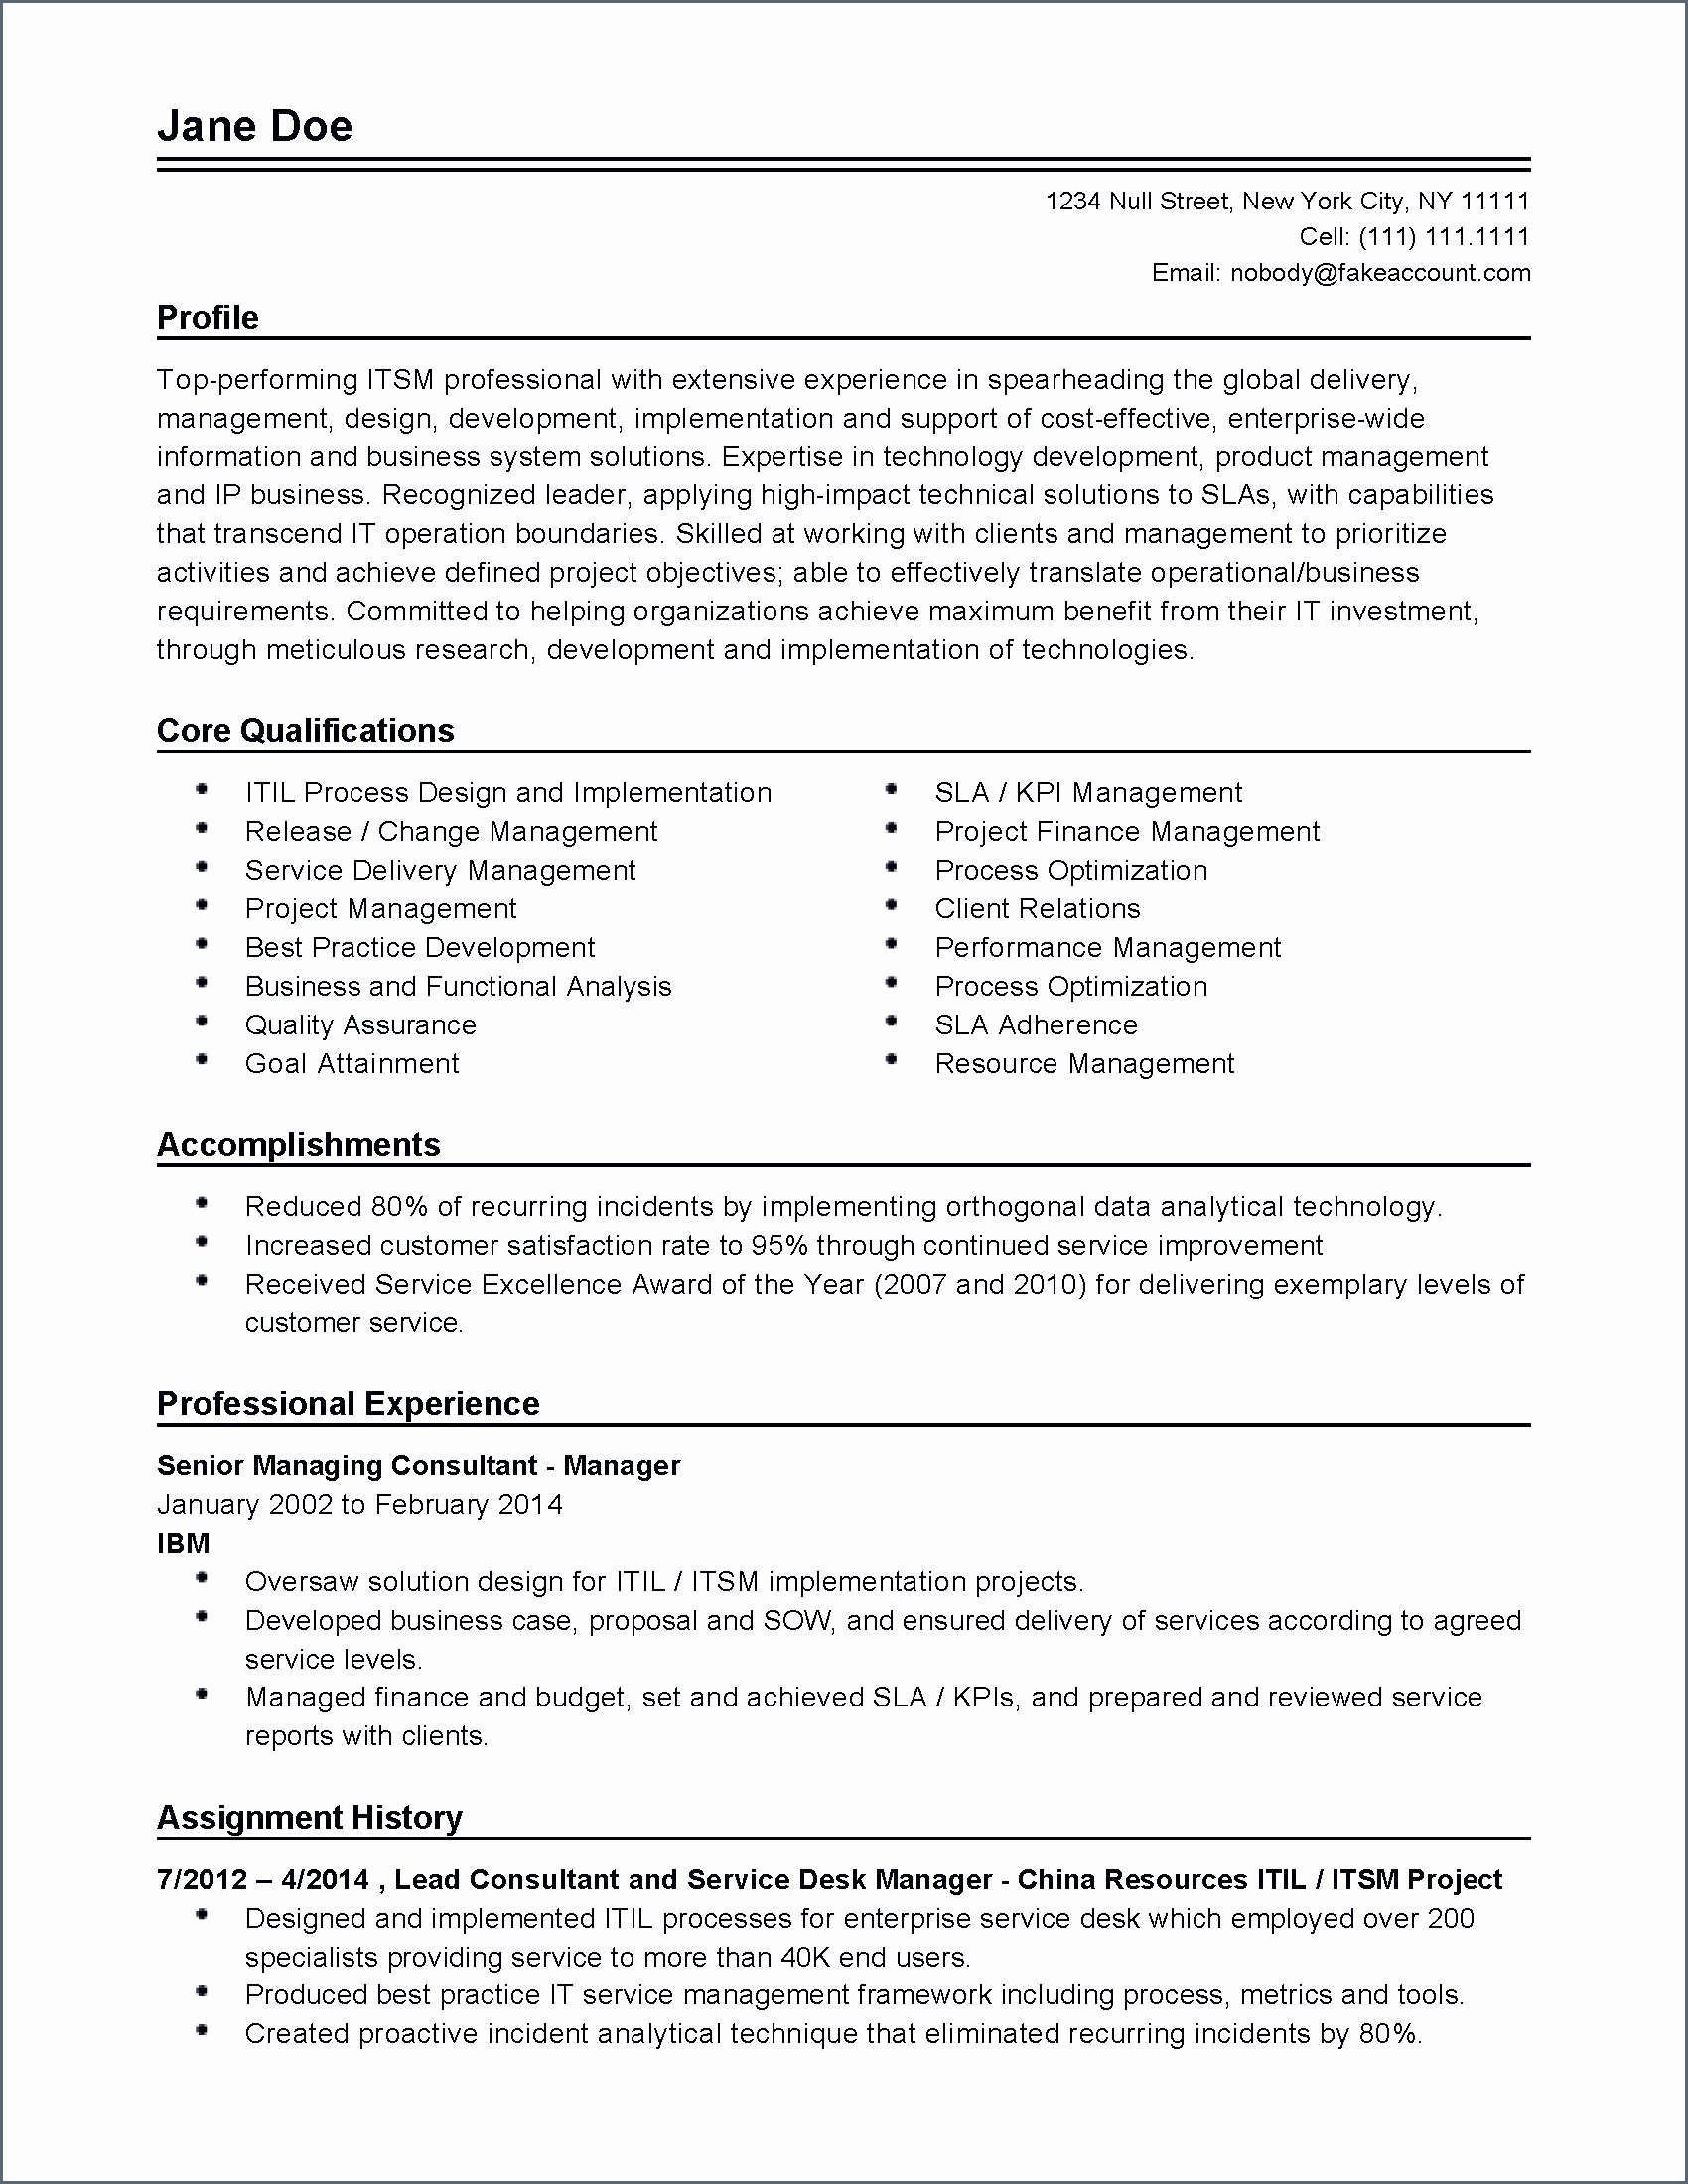 Graduate Nurse Resume Template Free Lovely New Graduate Nurse Resume Tag 45 Extraordinary New